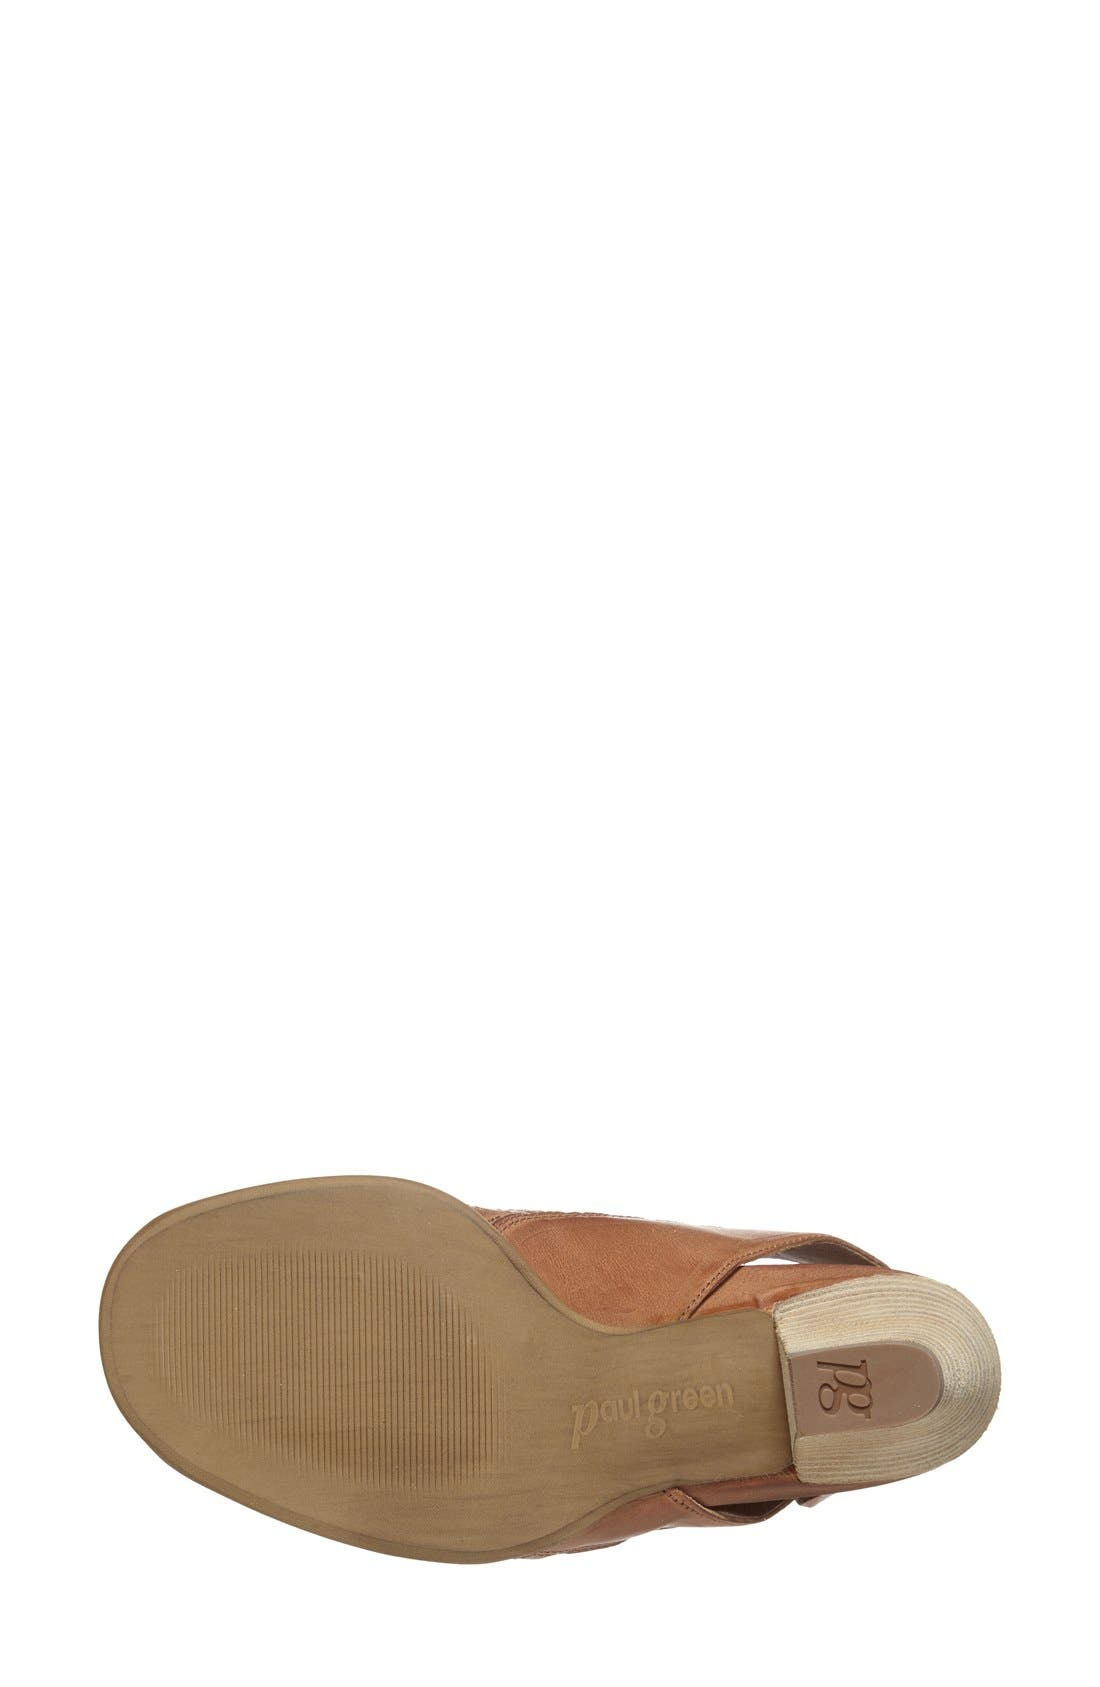 'Cayanne' Leather Peep Toe Sandal,                             Alternate thumbnail 31, color,